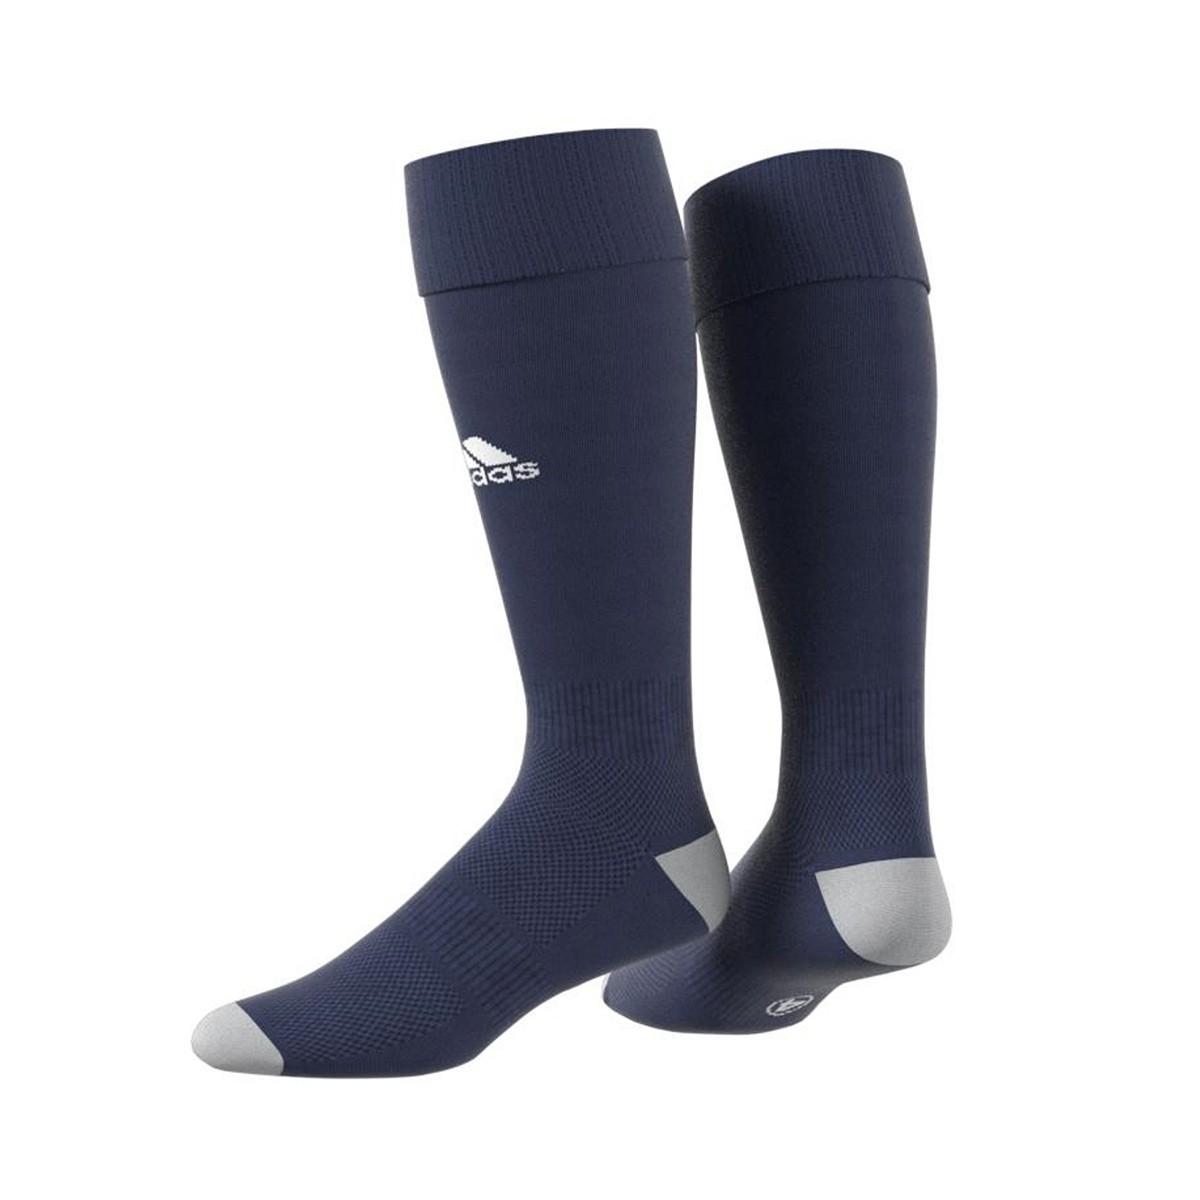 Chaussettes adidas Milano 16